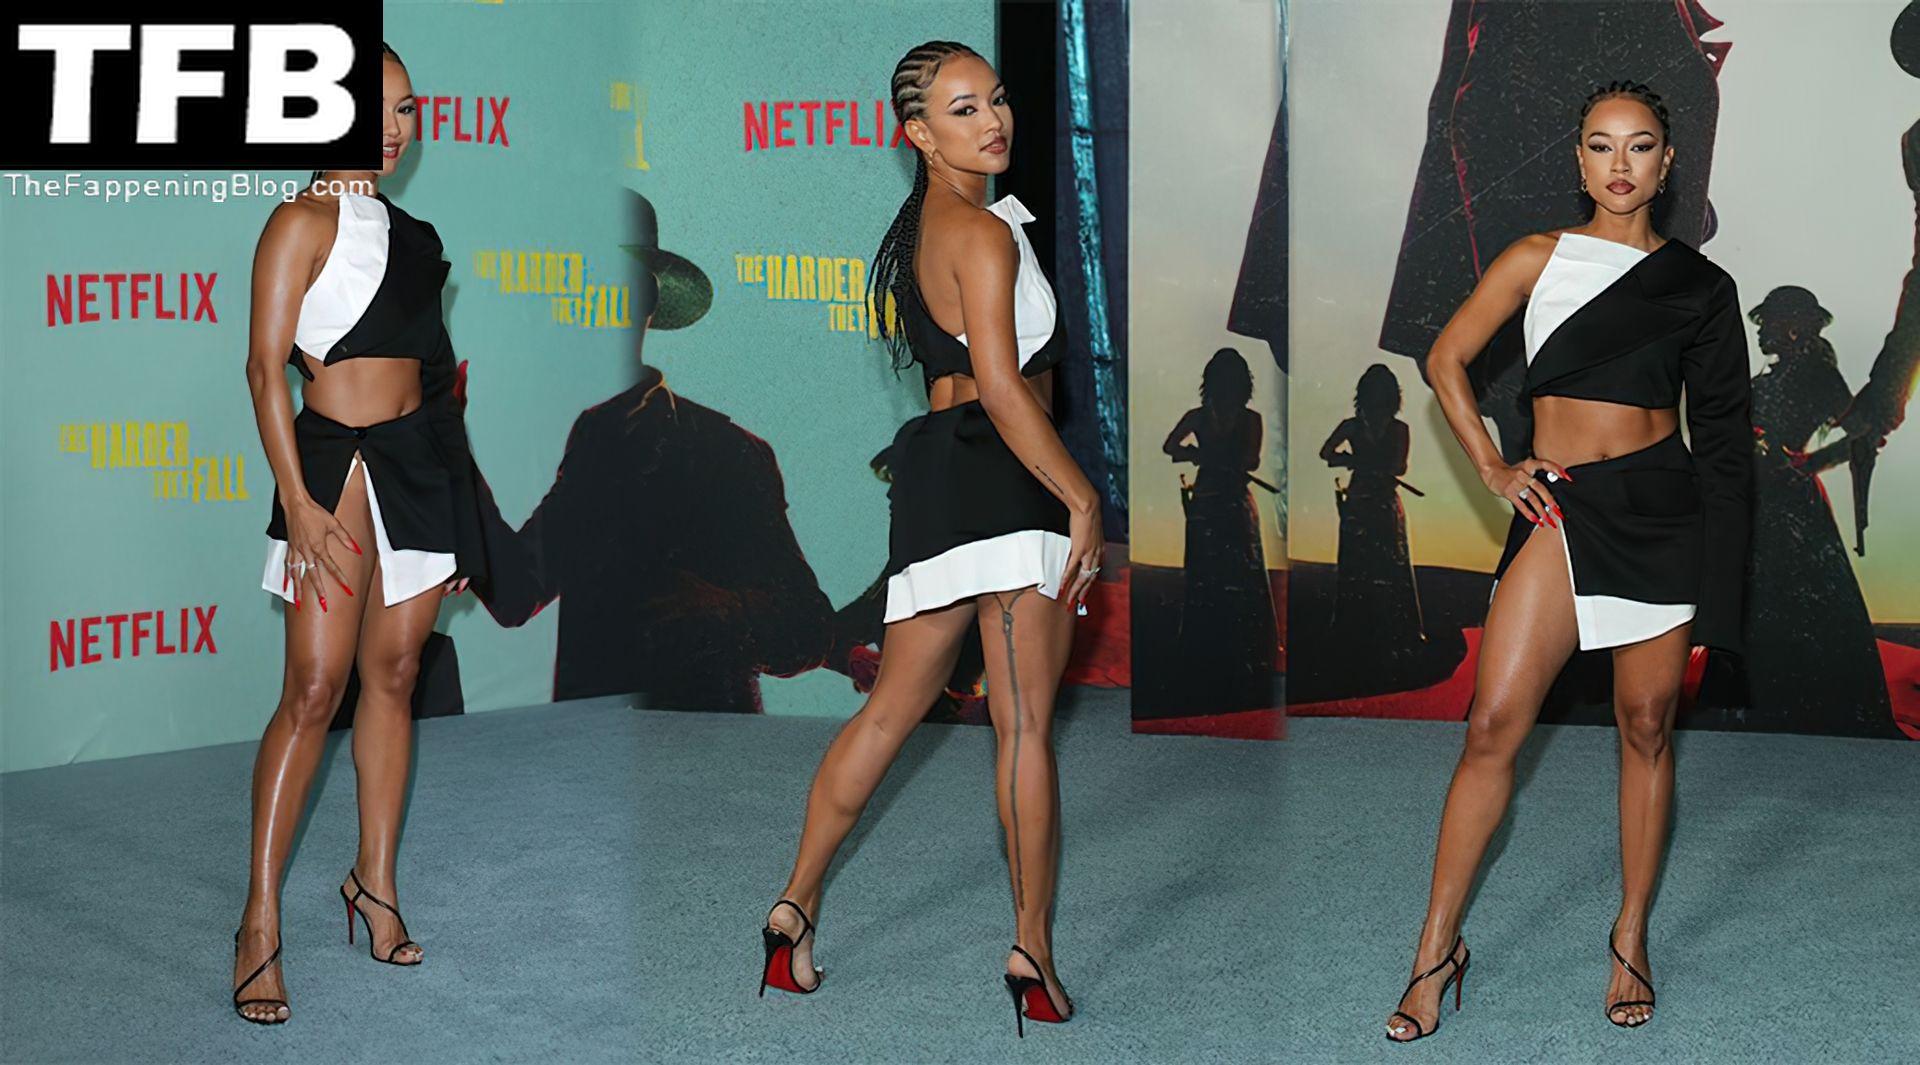 Karrueche-Tran-Sexy-Legs-Upskirt-The-Fappening-Blog-7.jpg